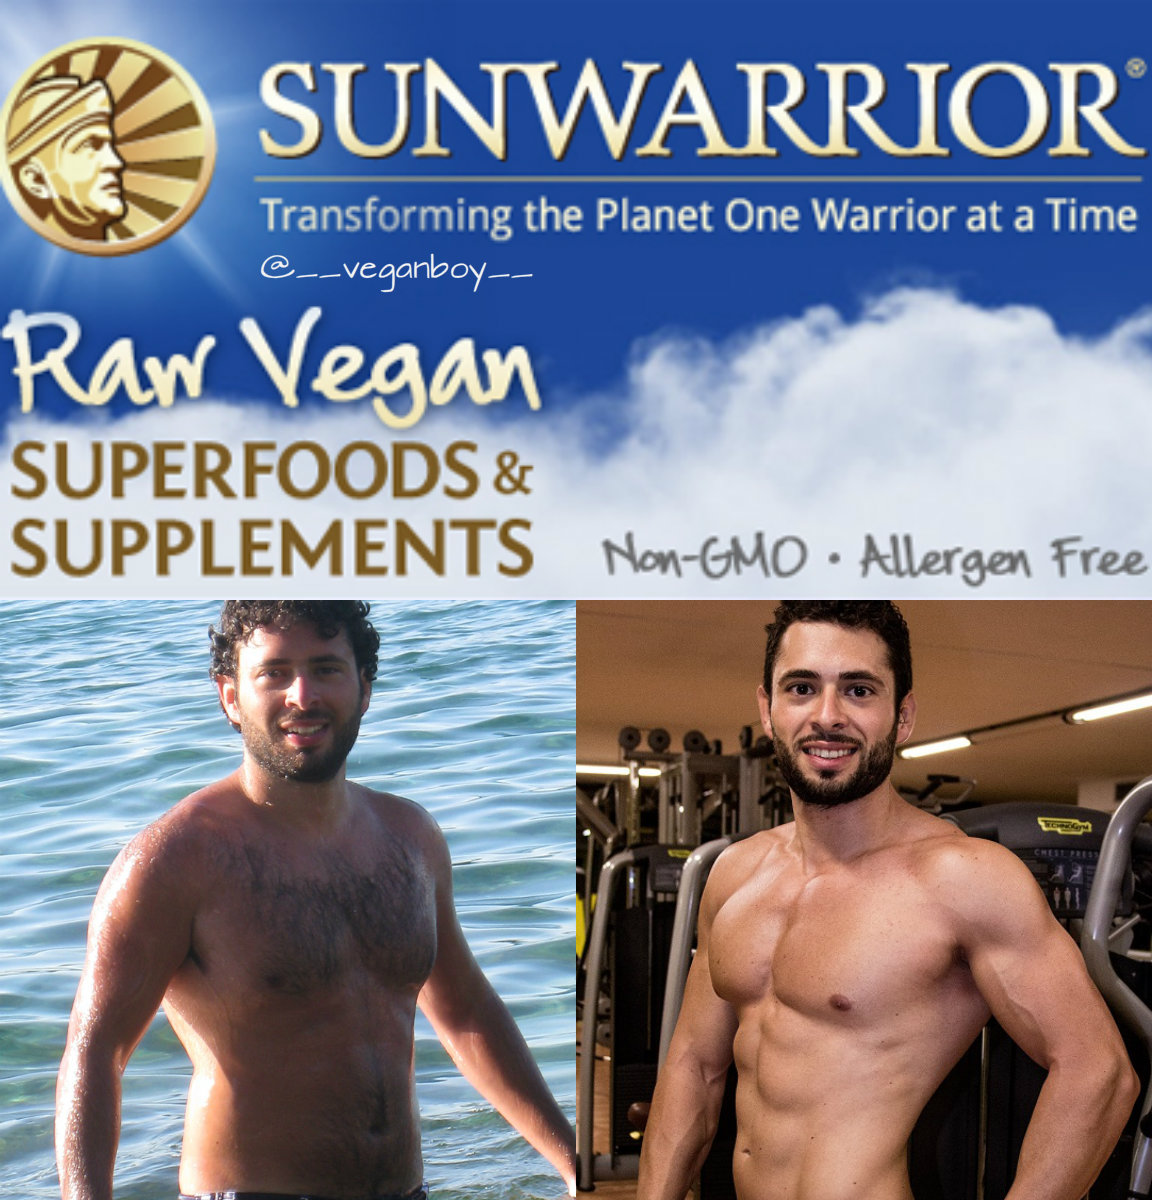 Sunwarrior Raw Vegan Protein